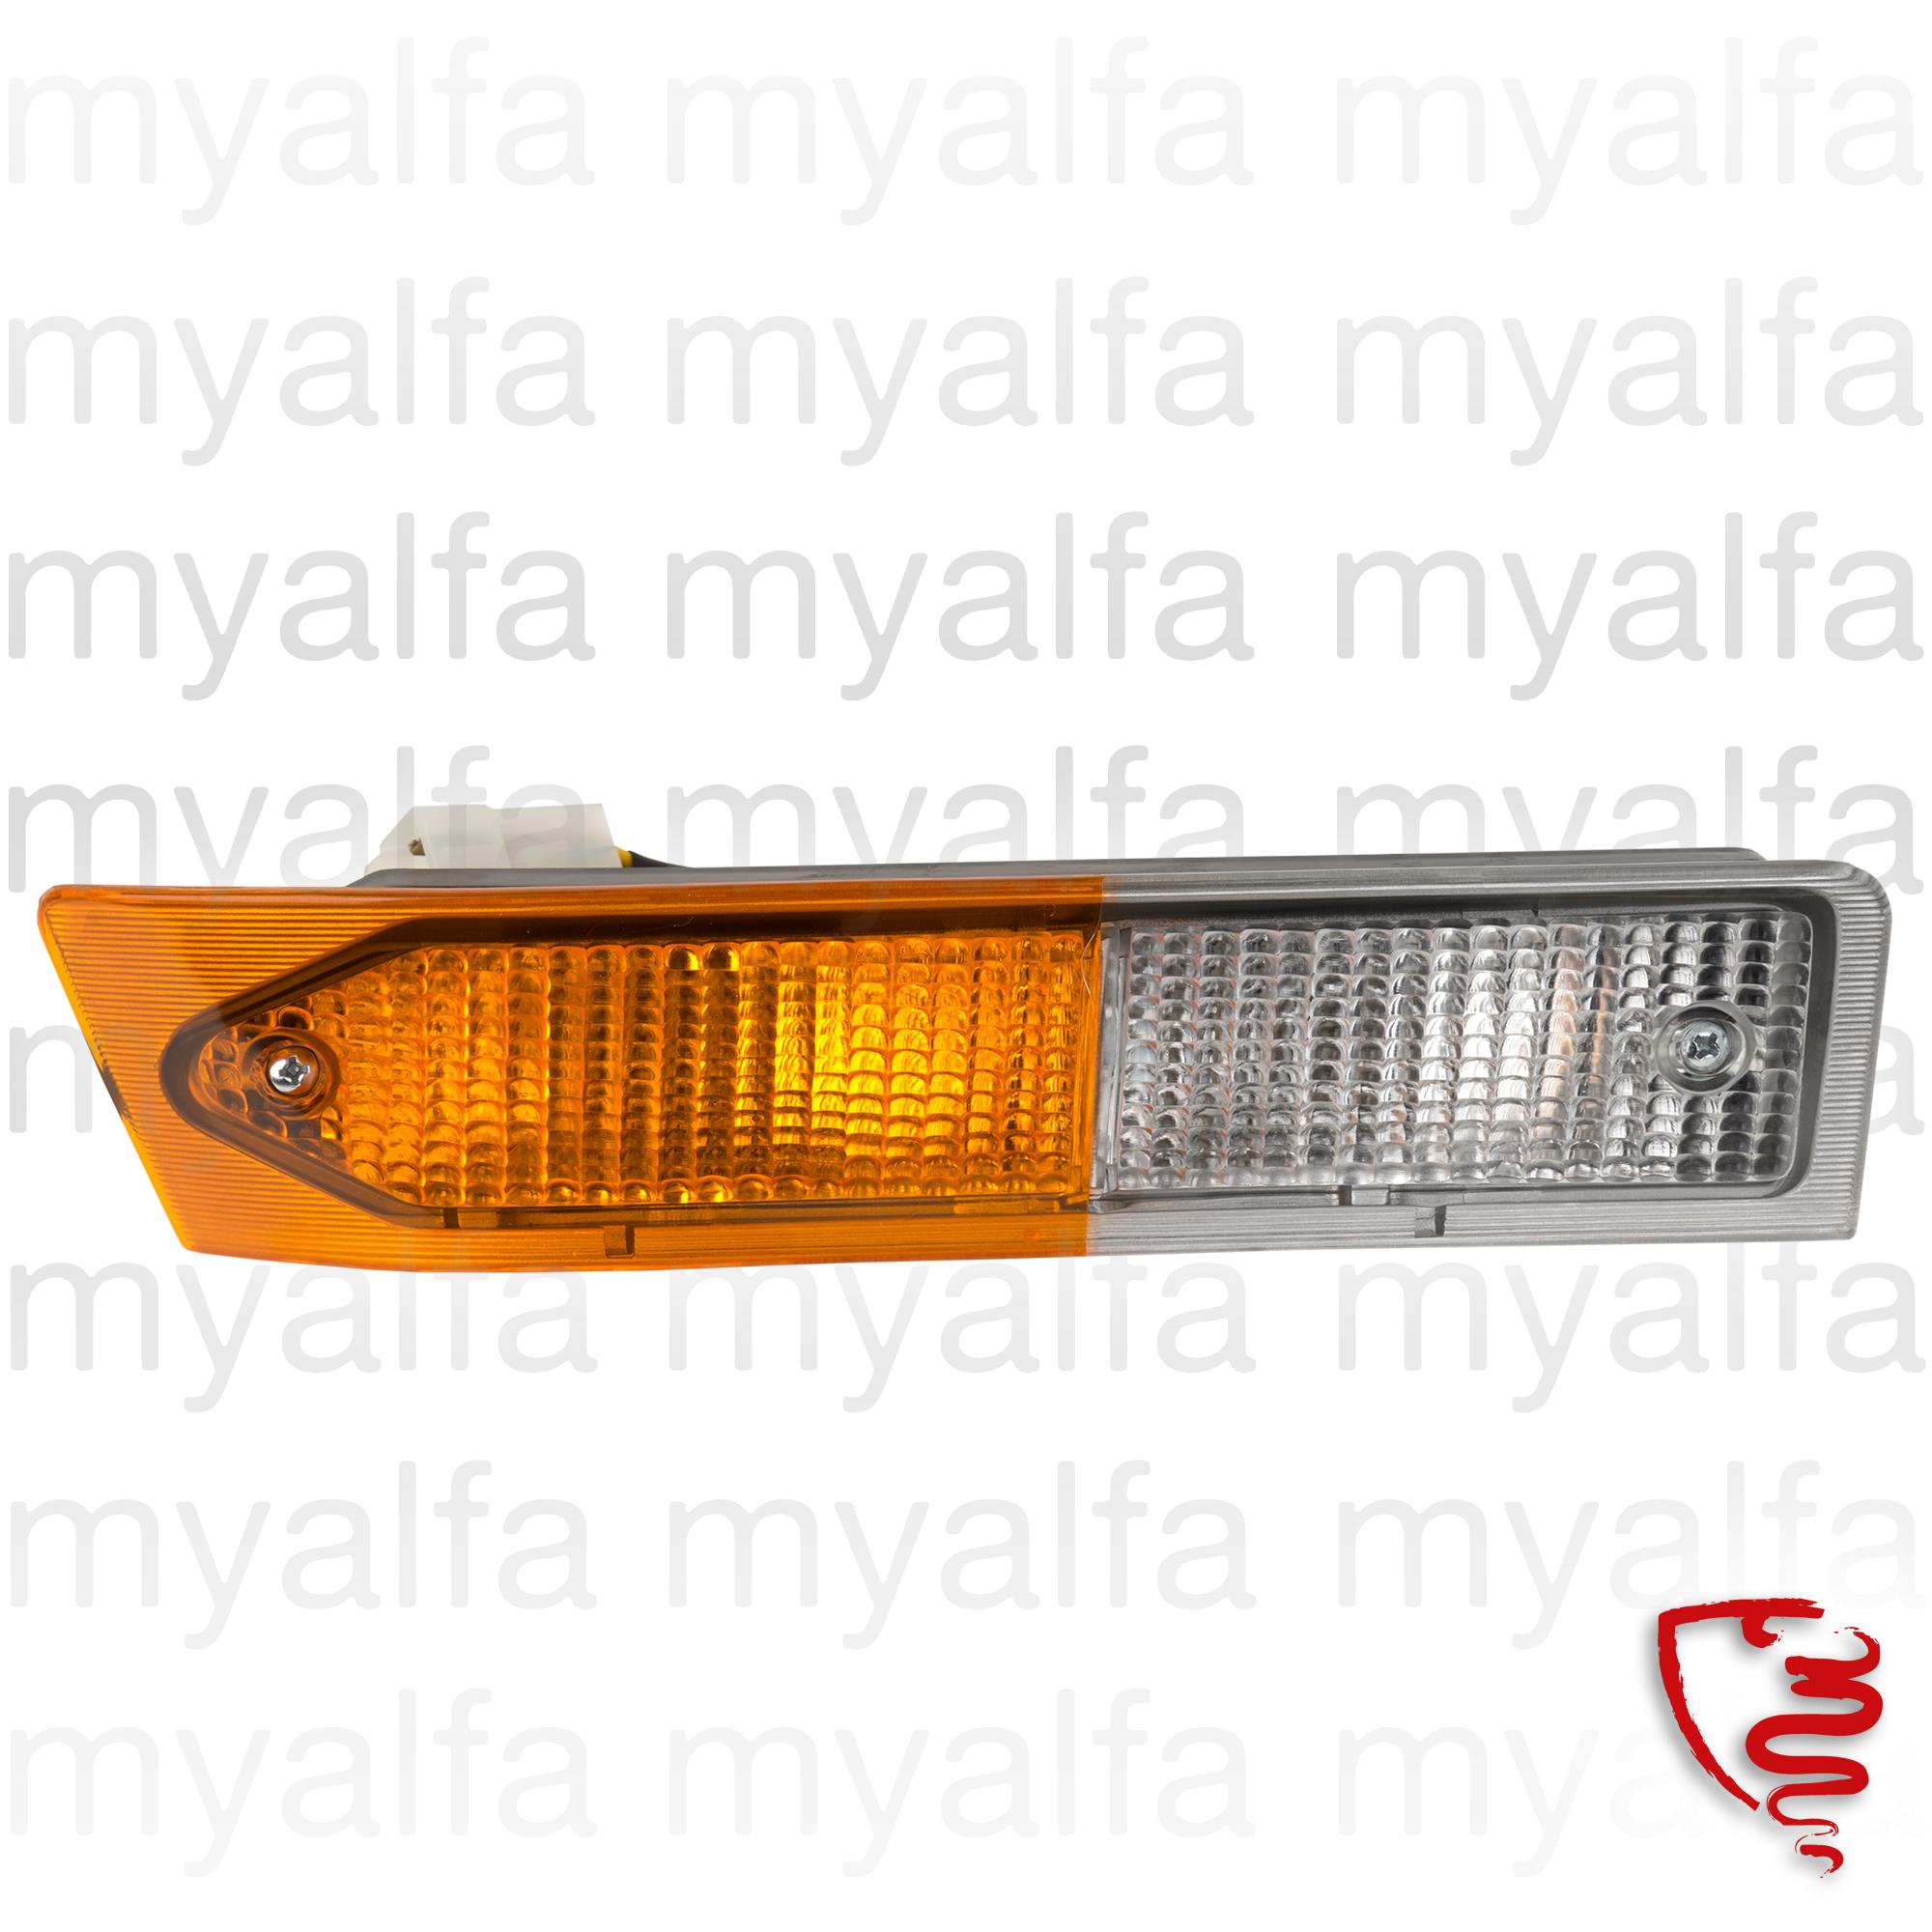 Beacon flashes and minimum frt. drt. Alfetta GTV 1st Series for 116/119, Body parts, Lighting, Indicators